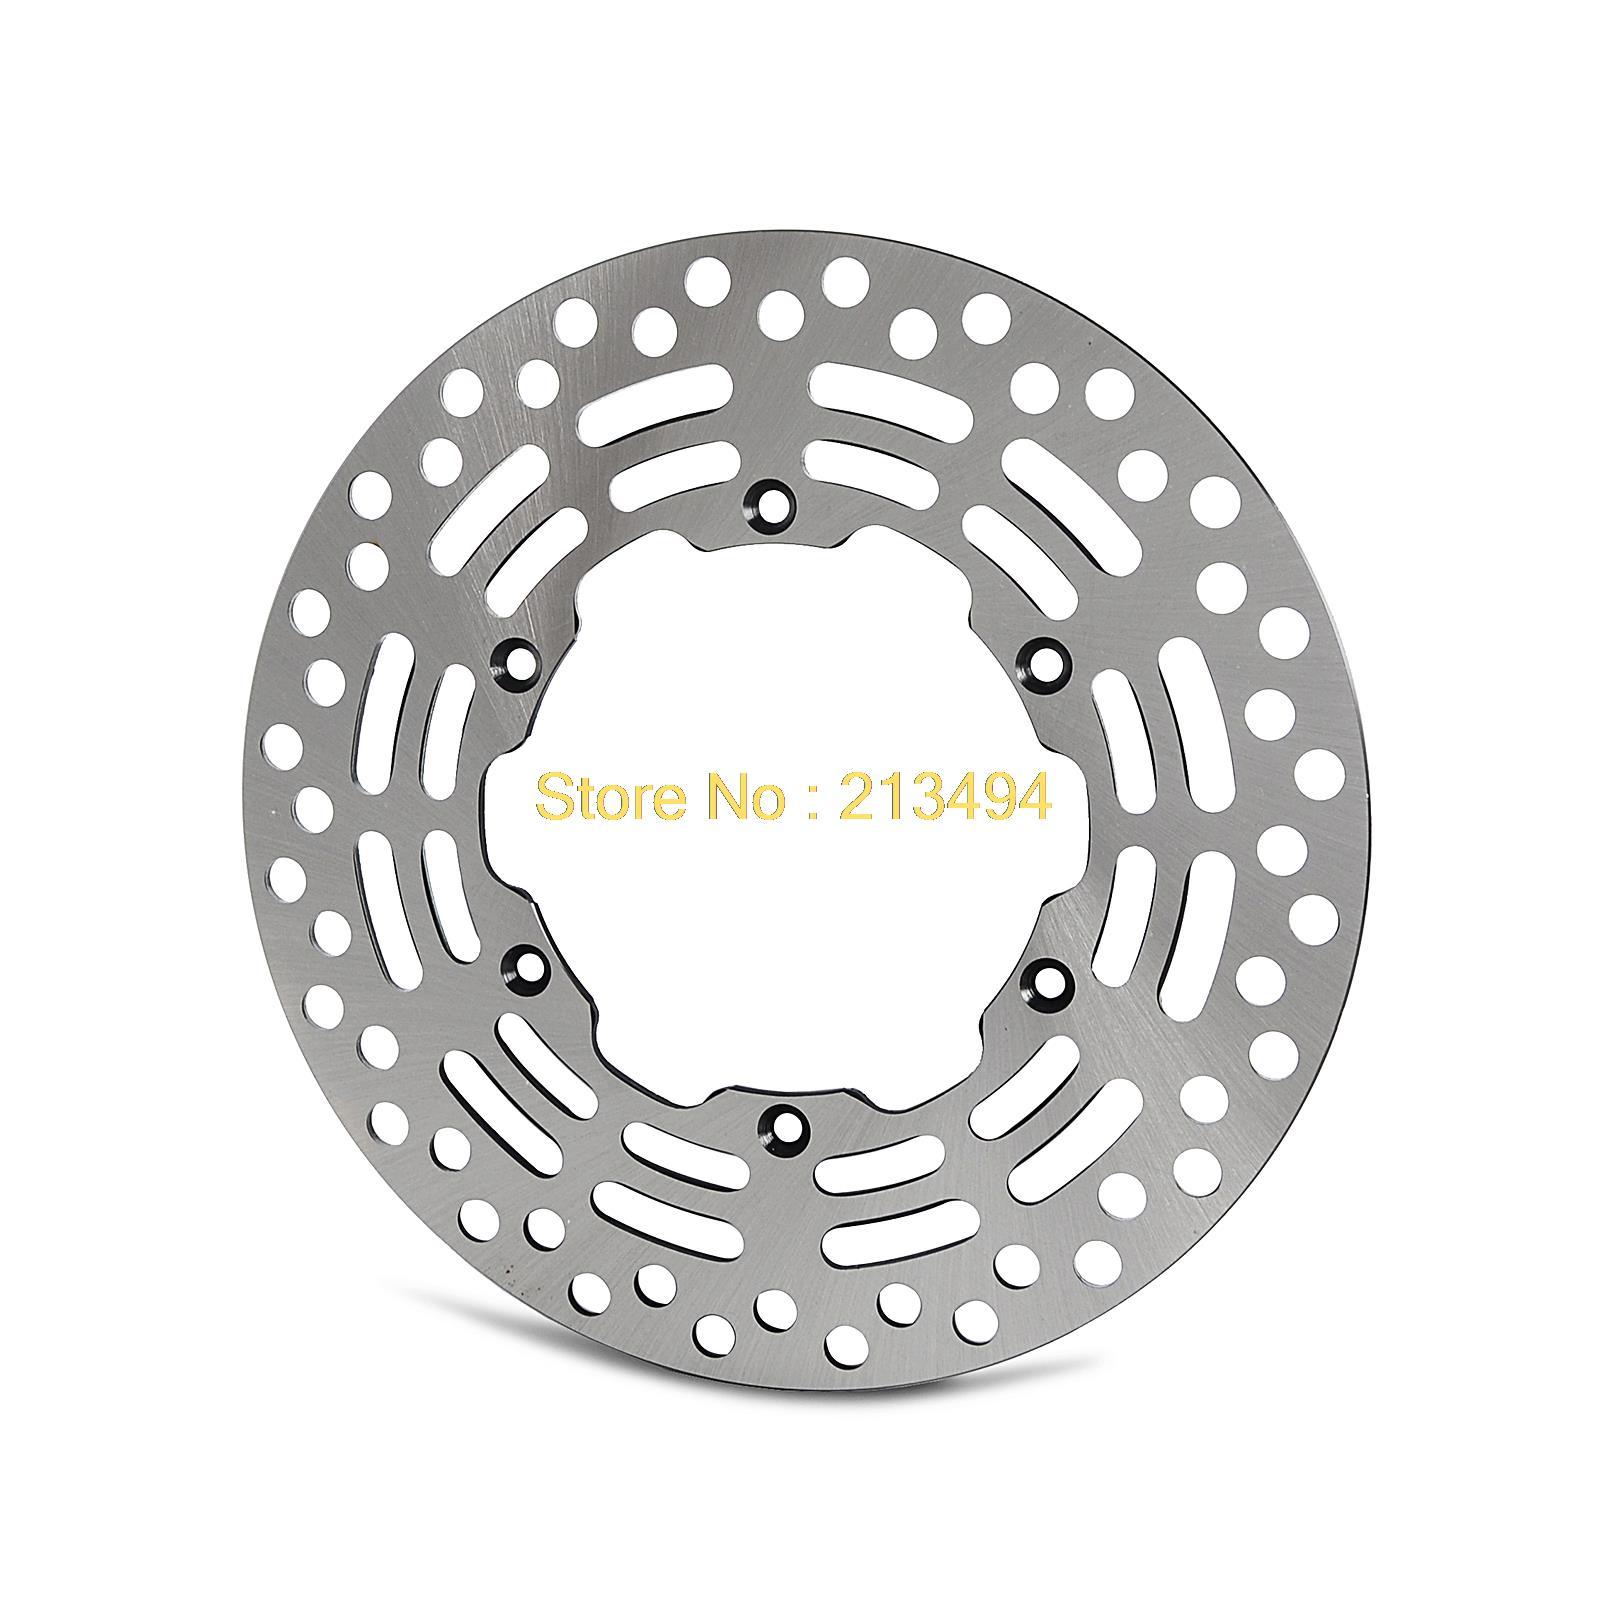 NICECNC Motorcycle Front Rotor Brake Disc For Suzuki RM125 250 RMX 250 DRZ250 DRZ400 Kawasaki 400cc KLX 400 SR R 2003 2006